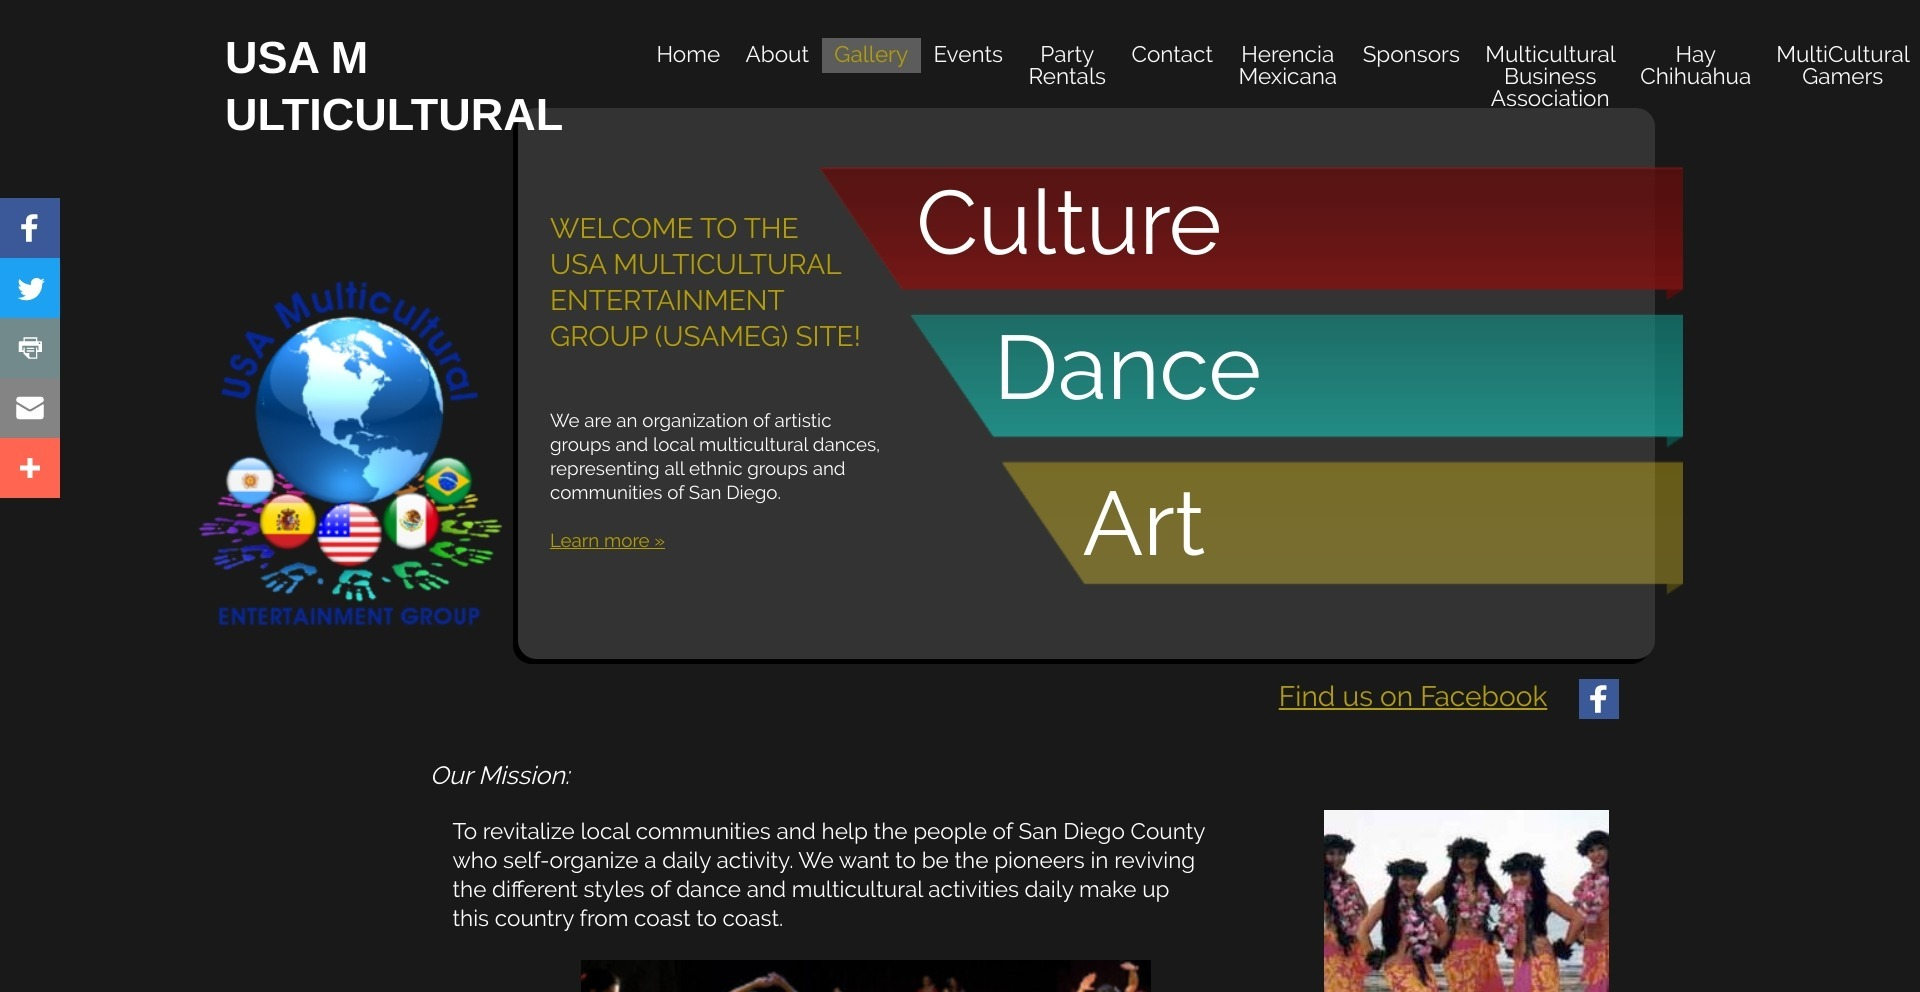 Multicultural Business Association